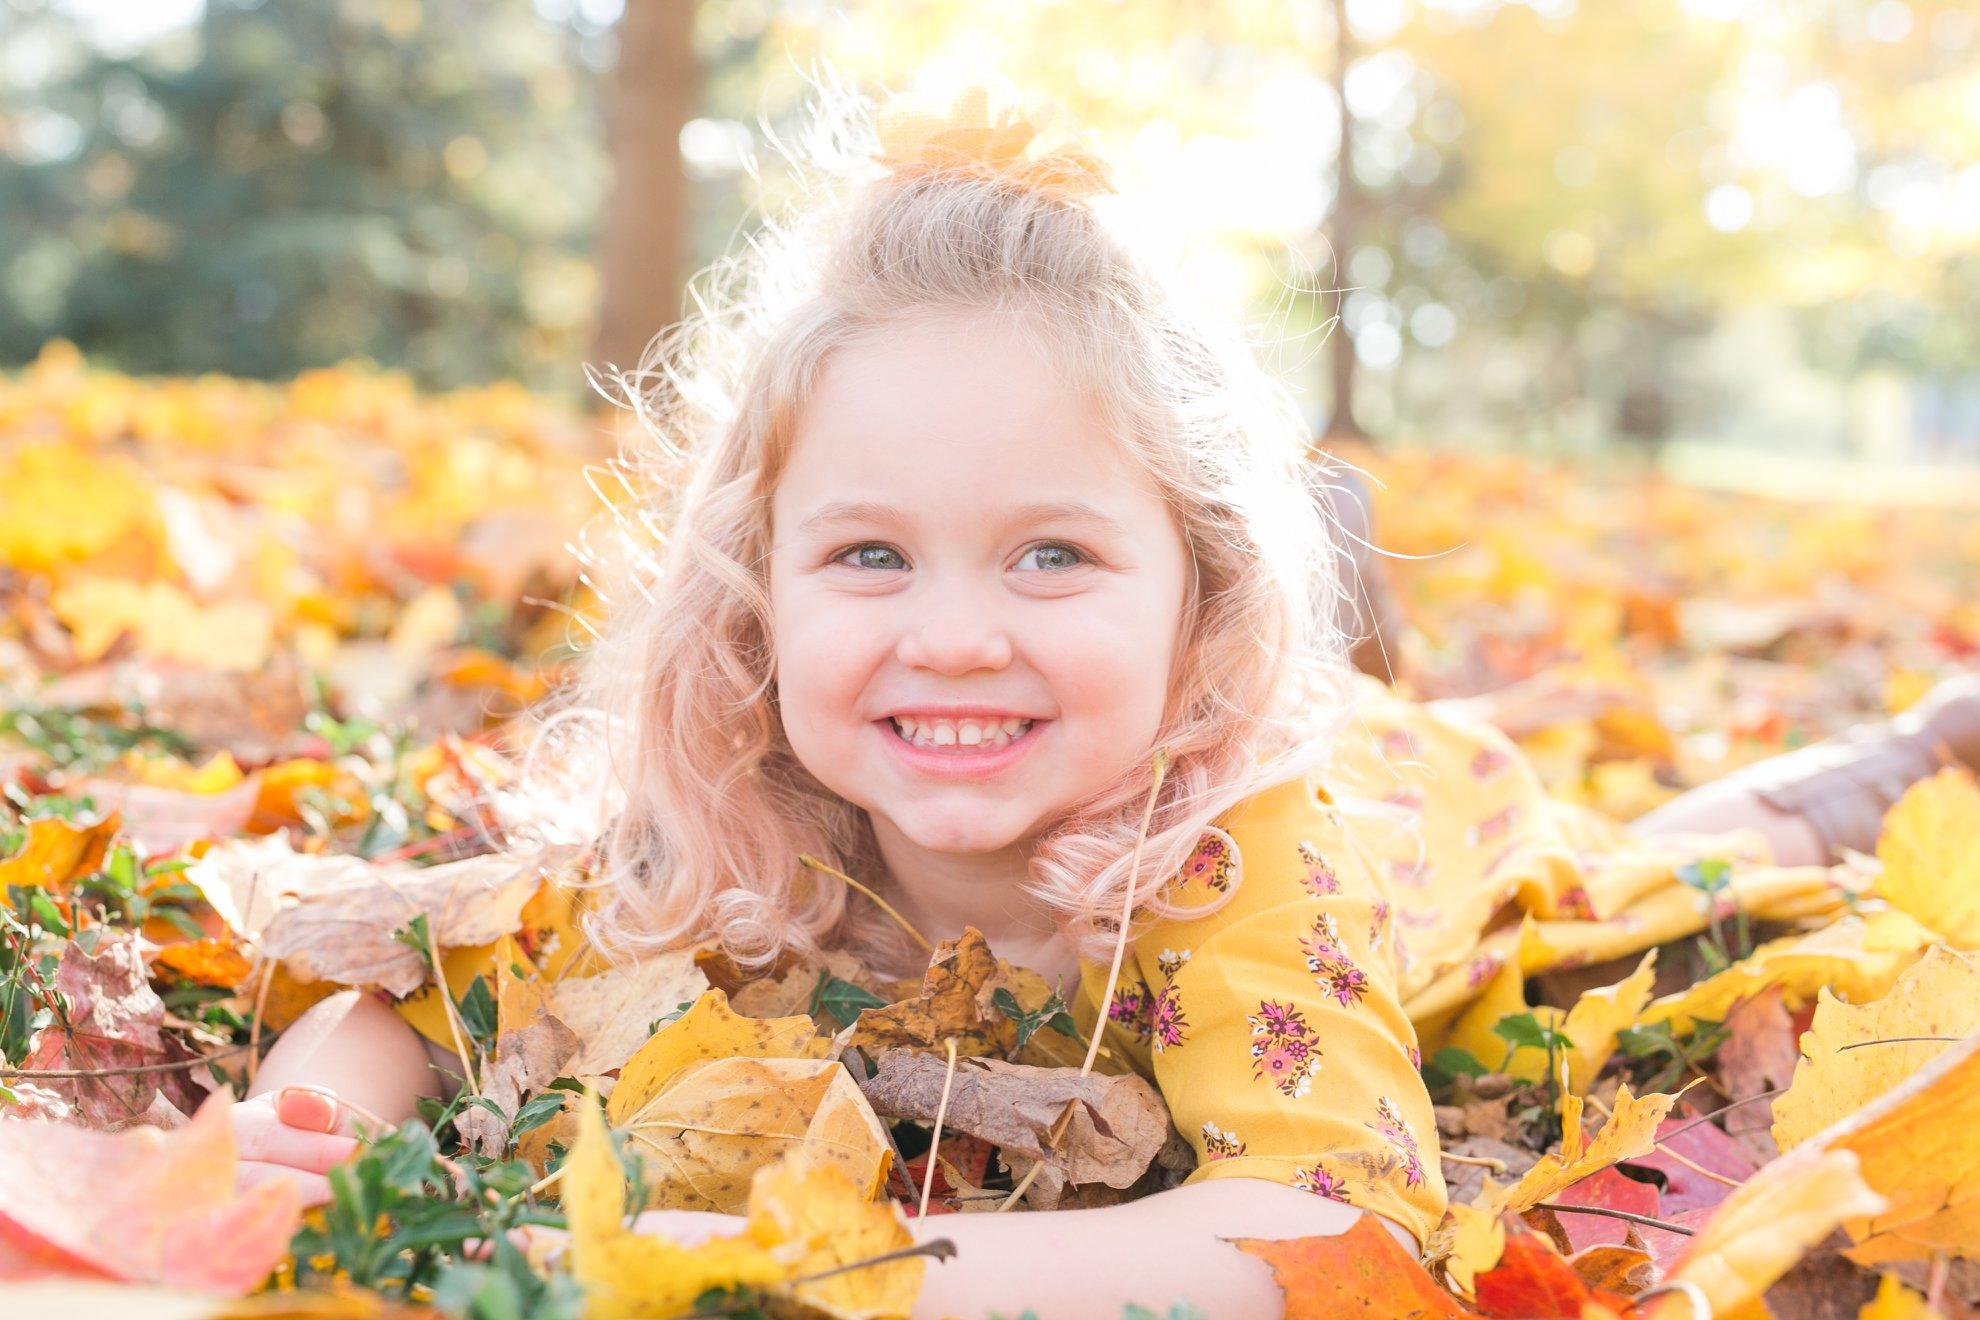 Franzetti Photography's Fall Mini Sessions Return!